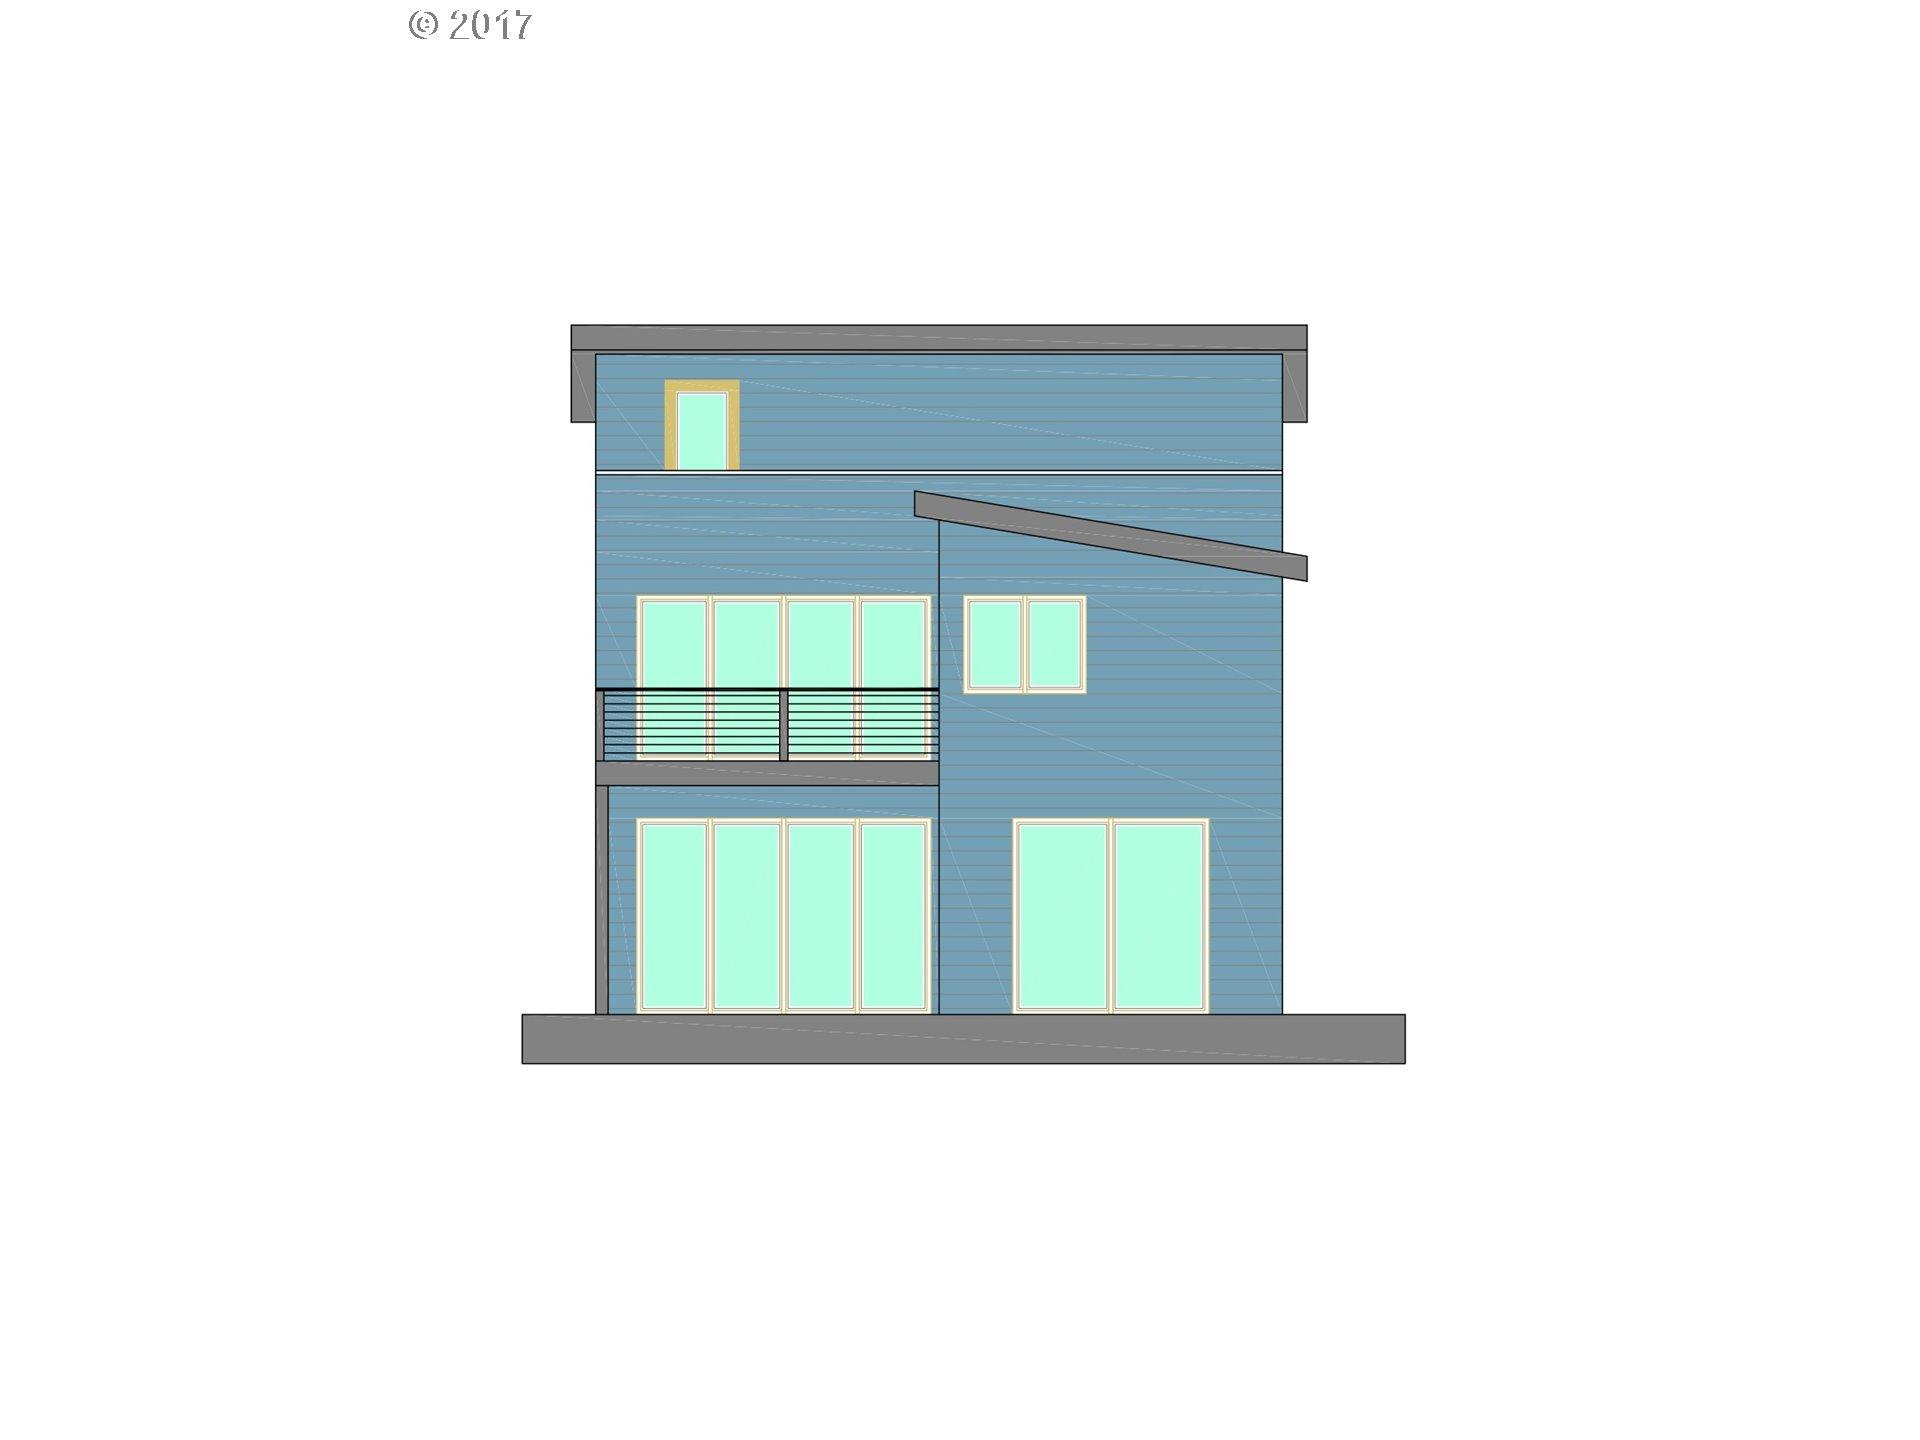 7720 SW Macadam AVE 1, Portland, OR 97219